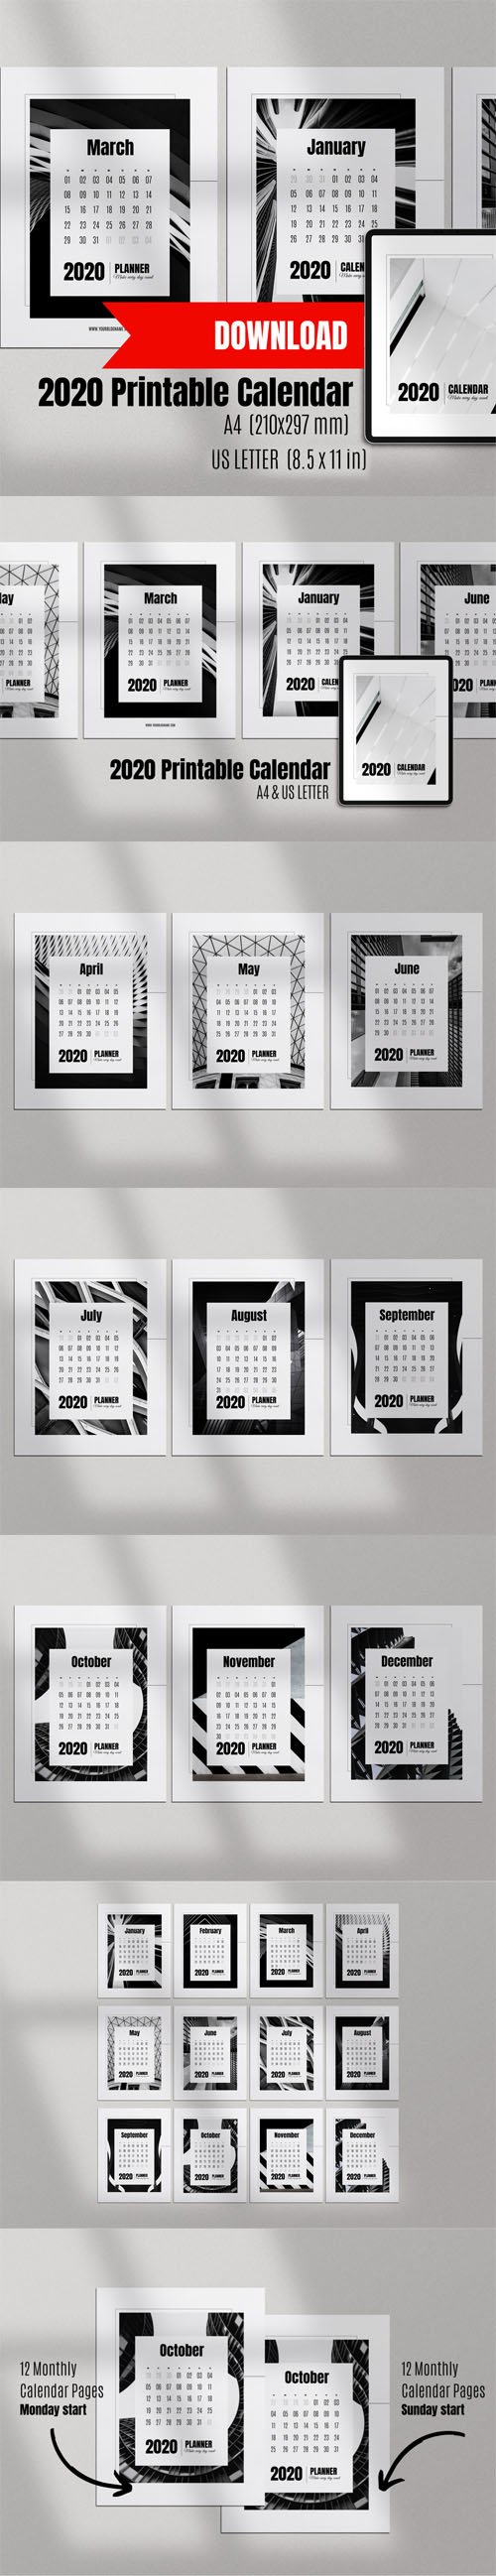 Printable Calendar 2020 PNG Templates [A4/US Letter]